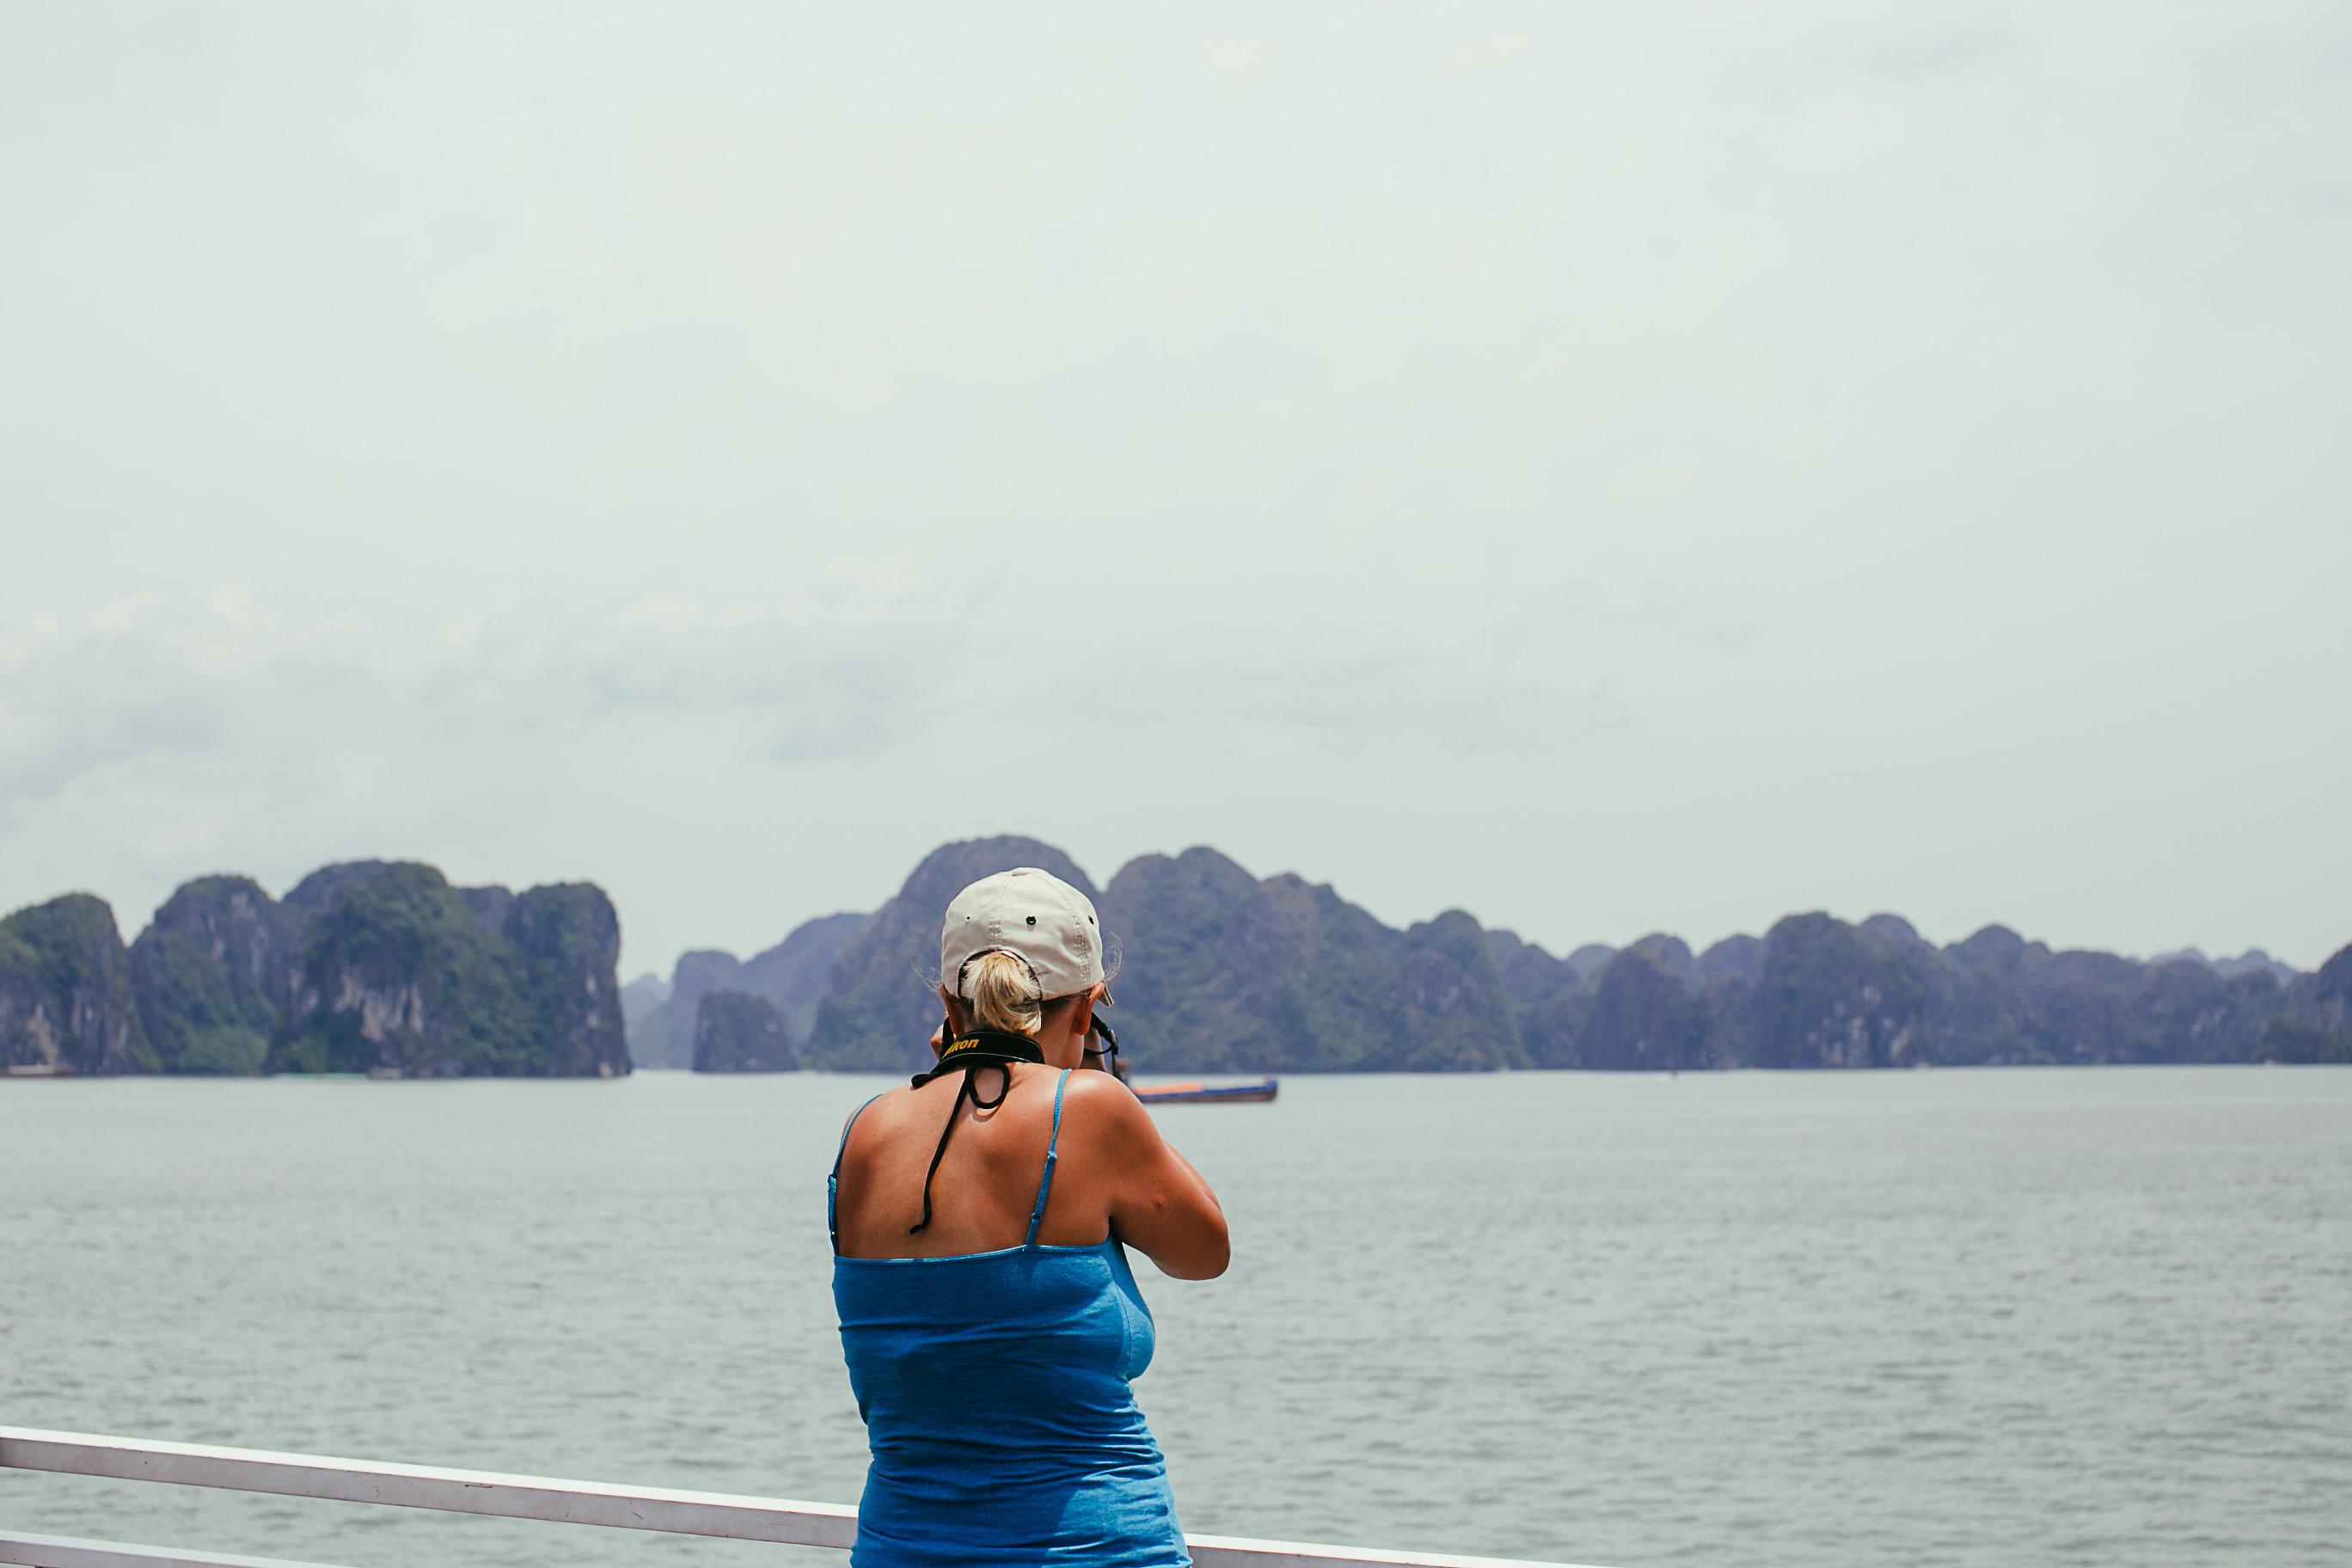 Cambodia and the Vietnam Coast by Land and Sea - Phnom Penh to Ho Chi Minh 2